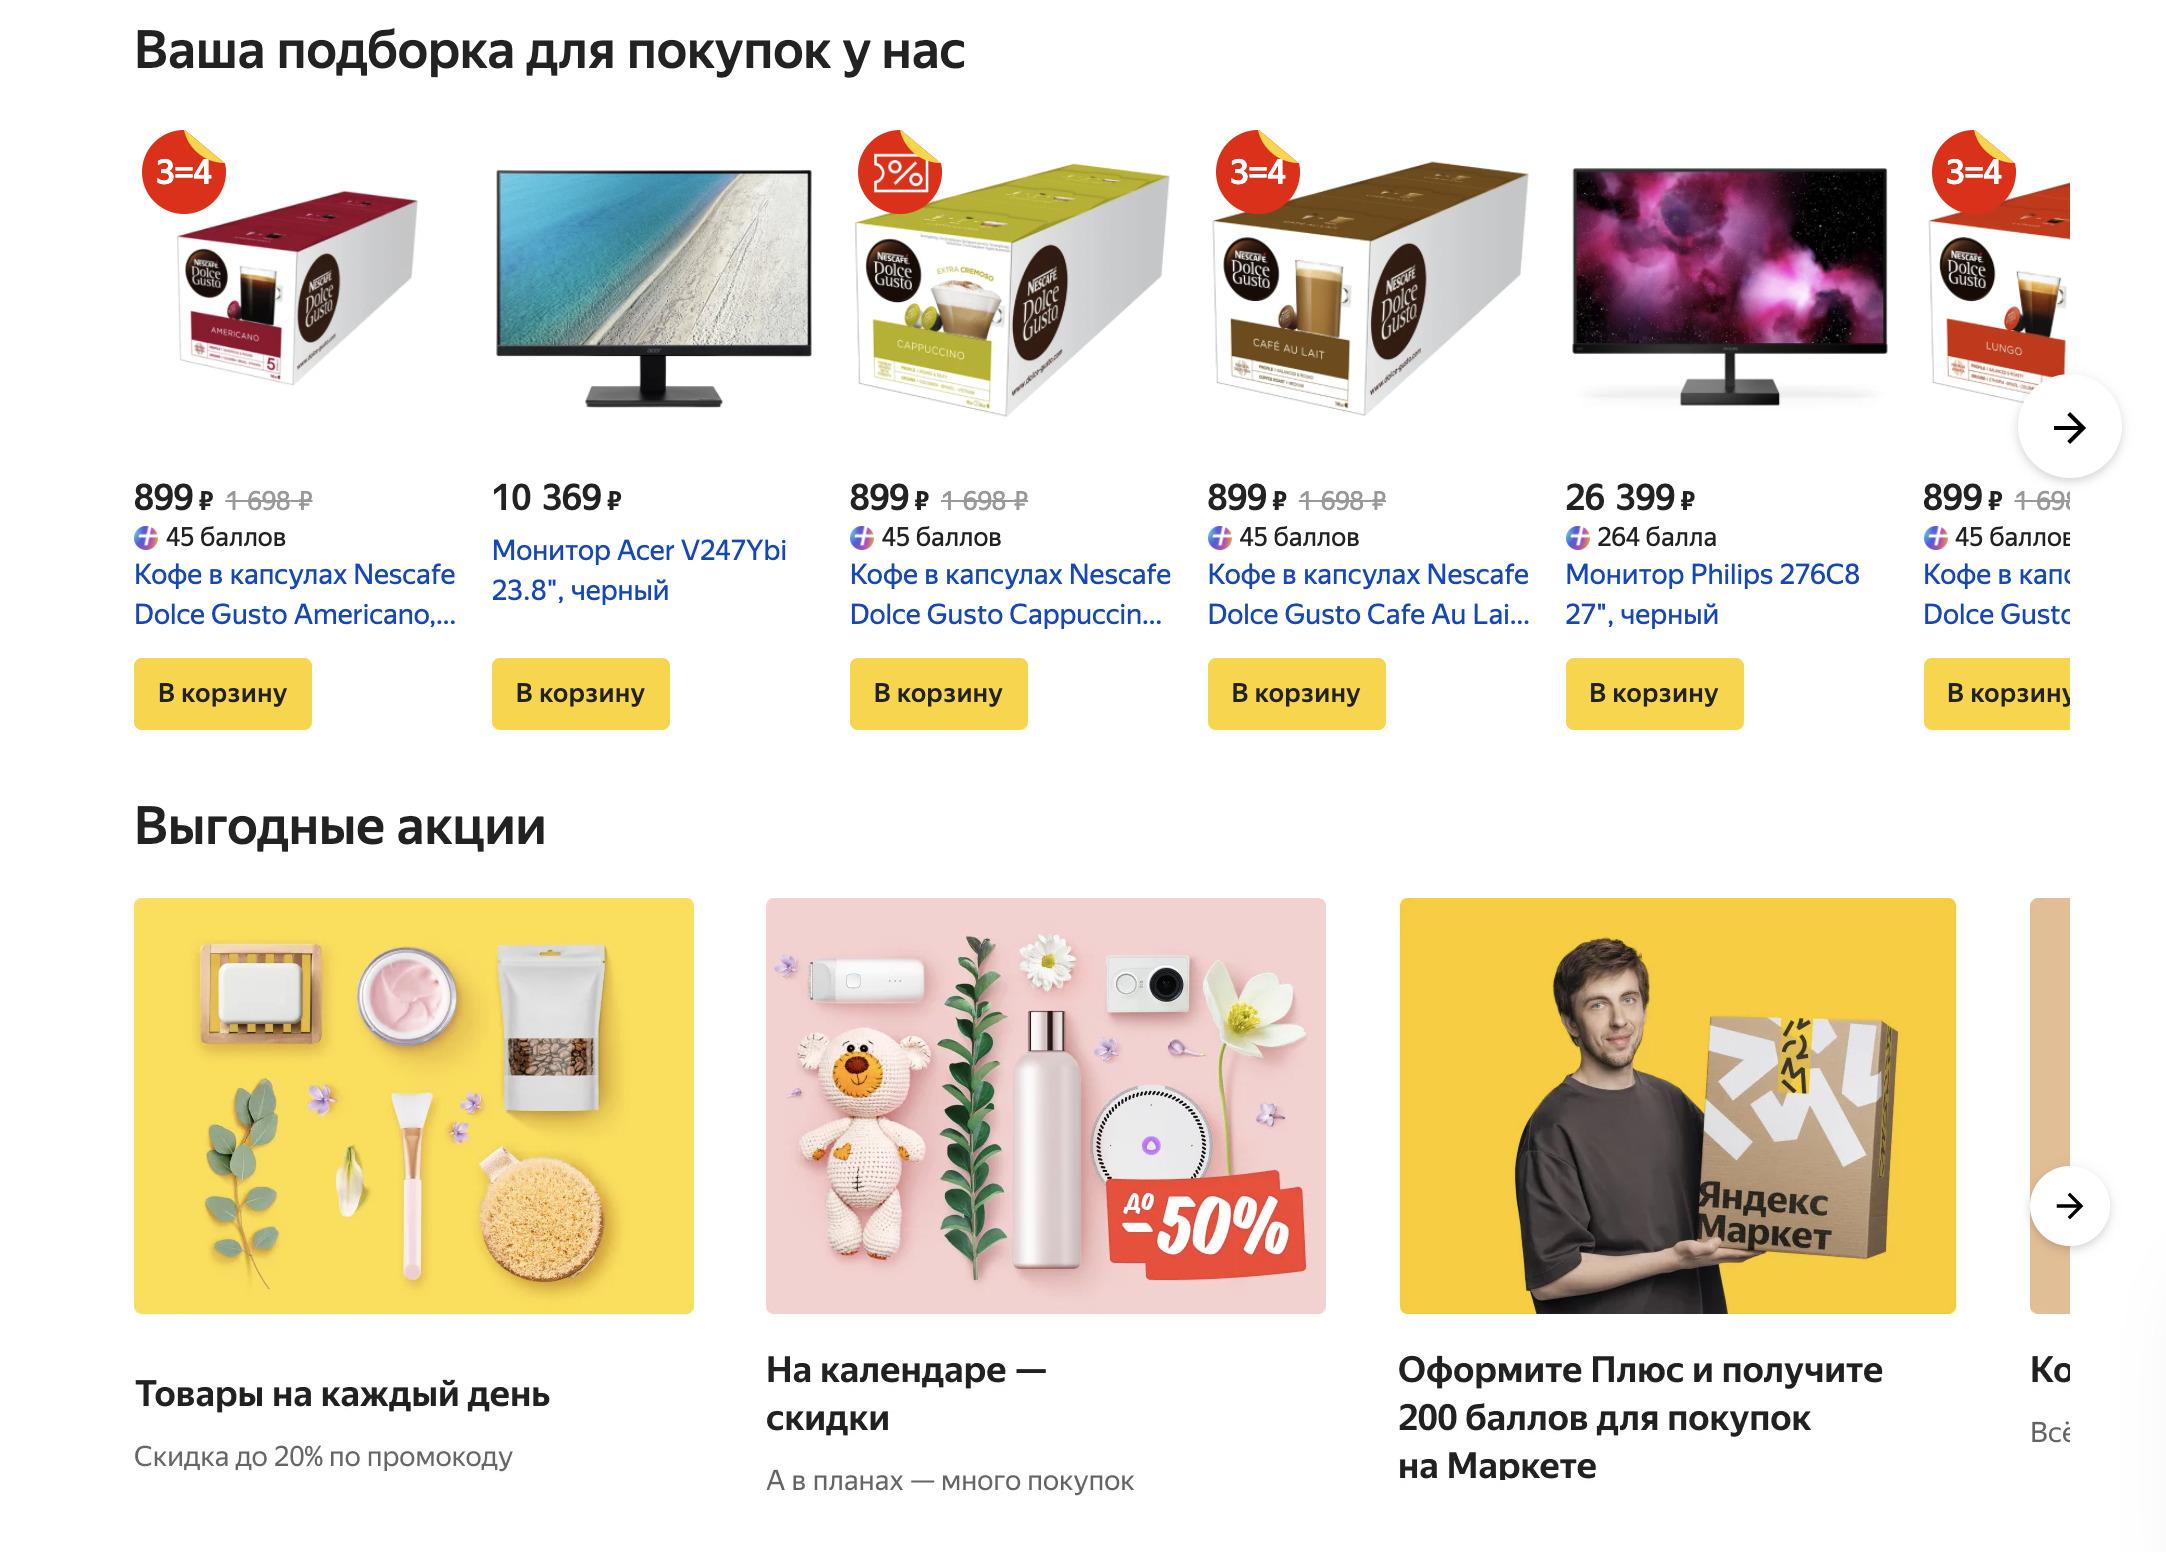 Доставка из Яндекс.Маркет в Самара, сроки, пункты выдачи, каталог